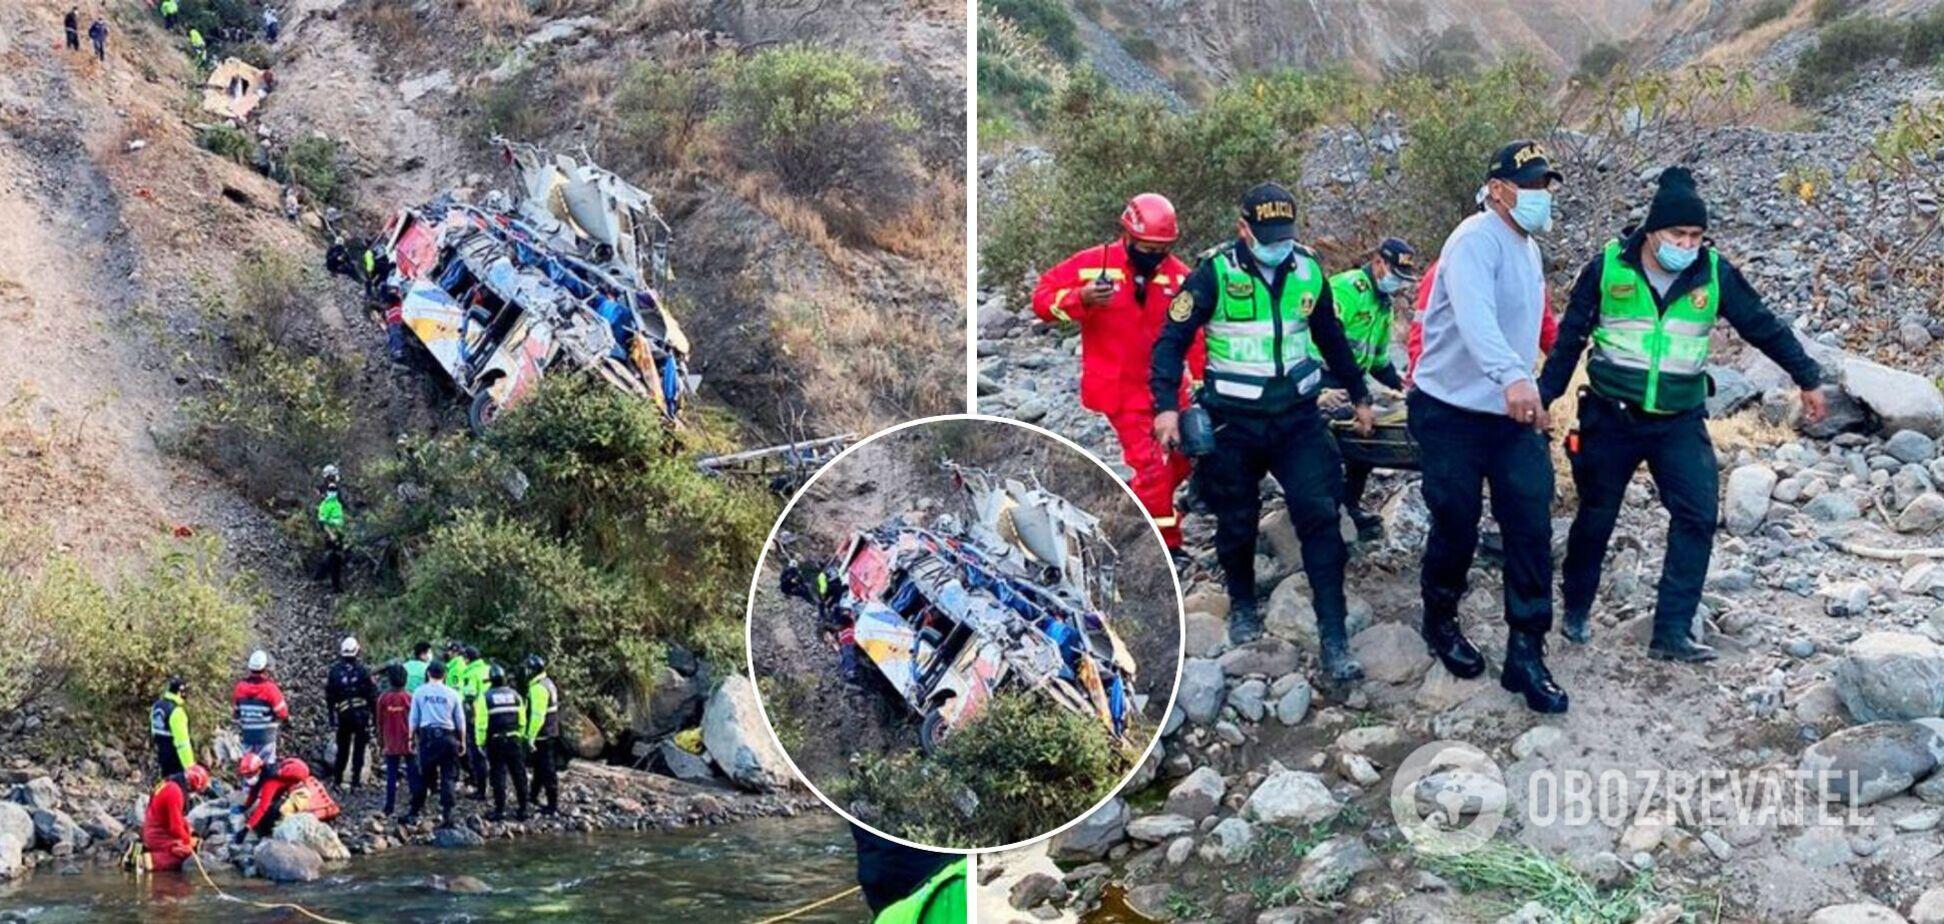 У Перу впав в ущелину пасажирський автобус: 17 загиблих і десятки потерпілих. Фото